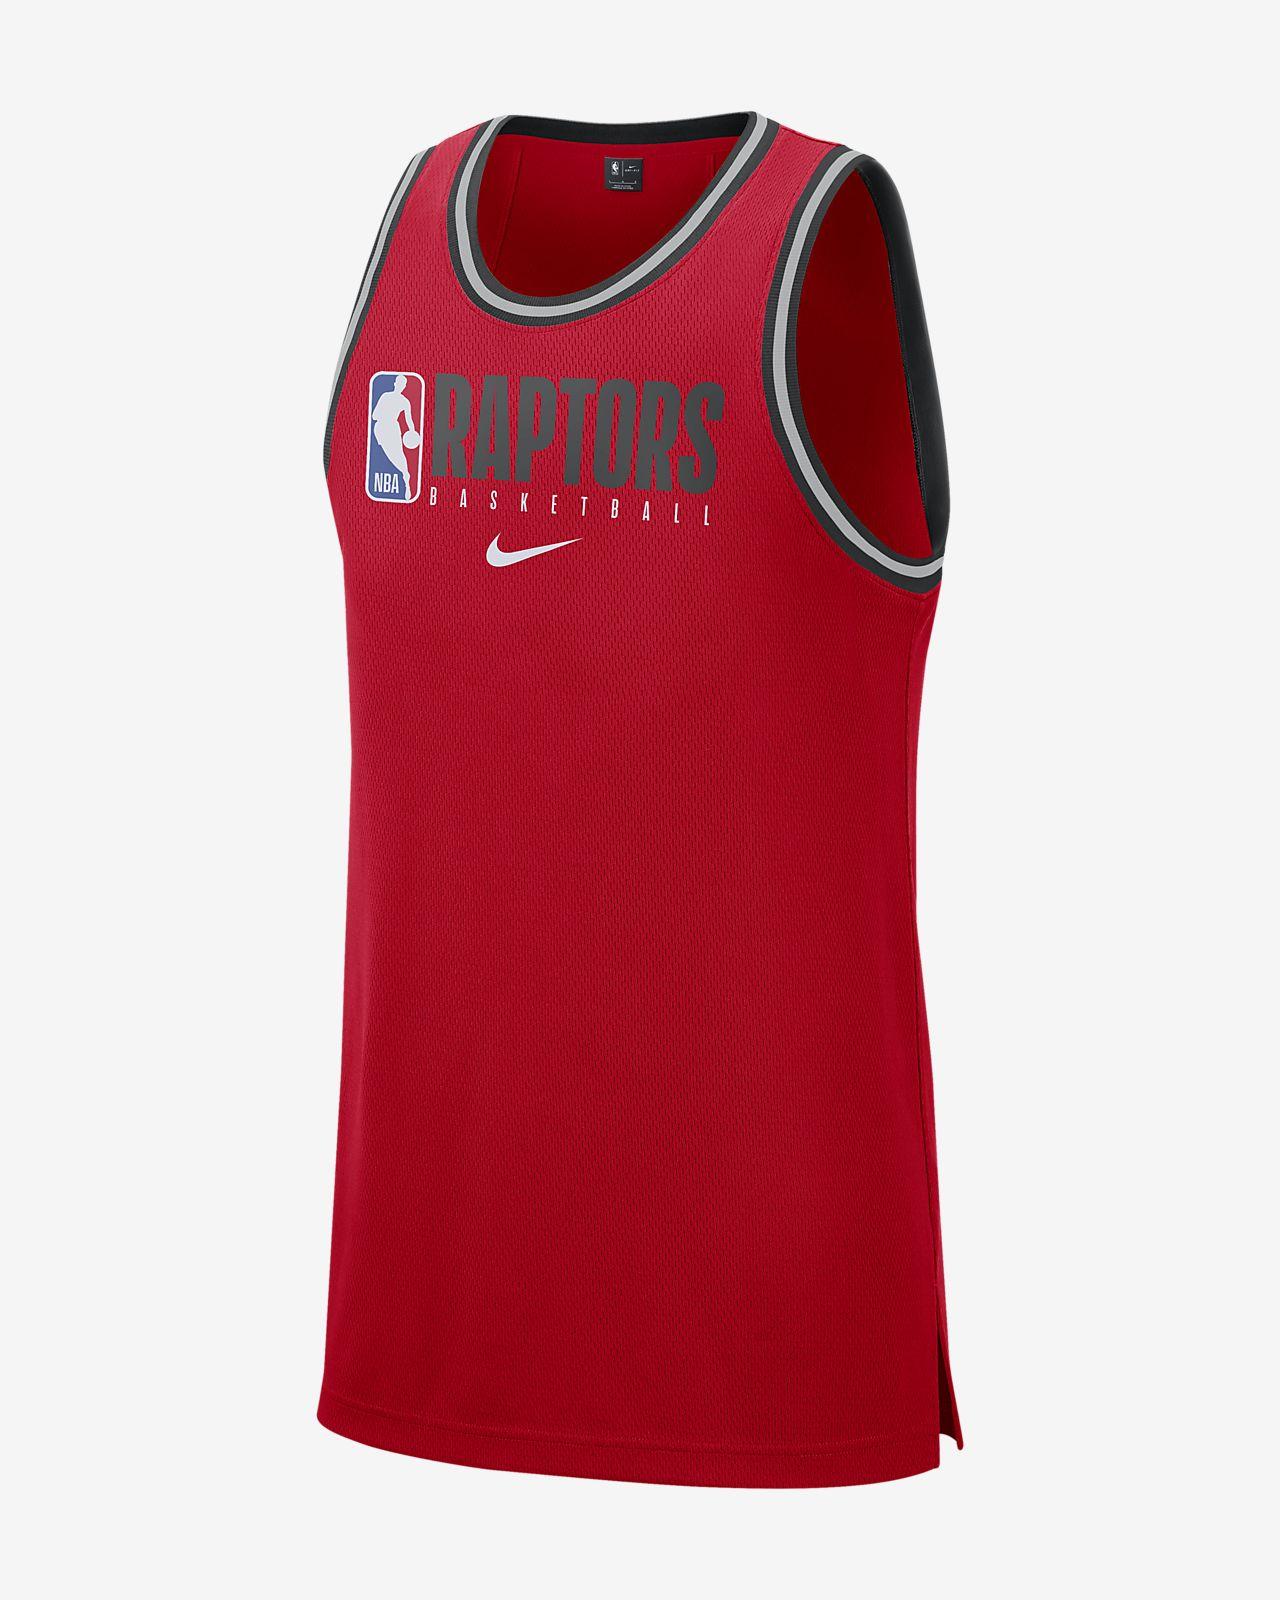 Canotta Toronto Raptors Nike Dri-FIT NBA - Uomo